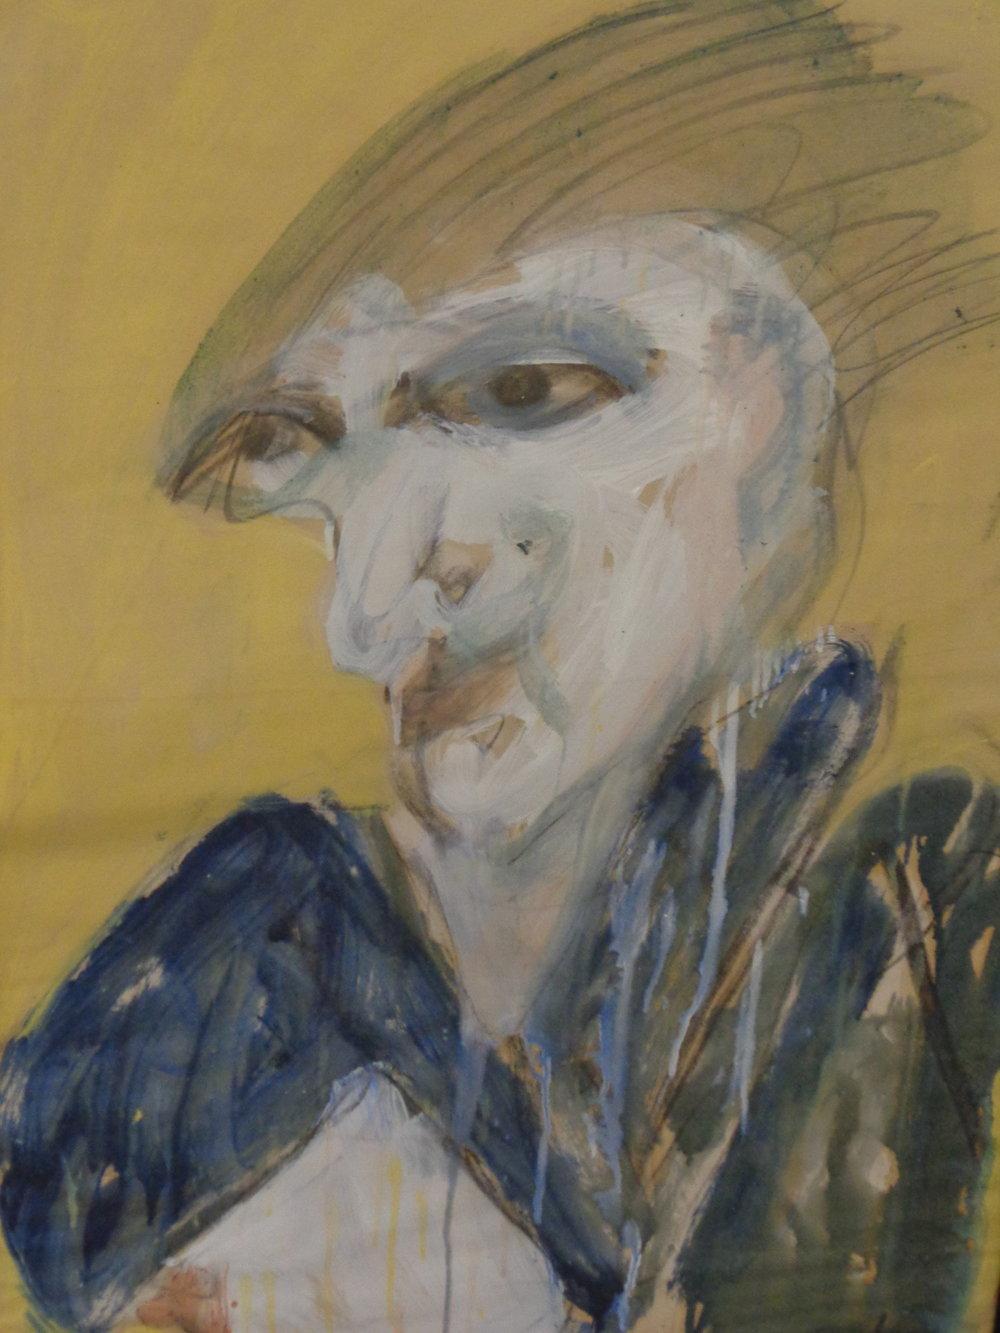 Siobahn Dreaming - Oil on paper 2013